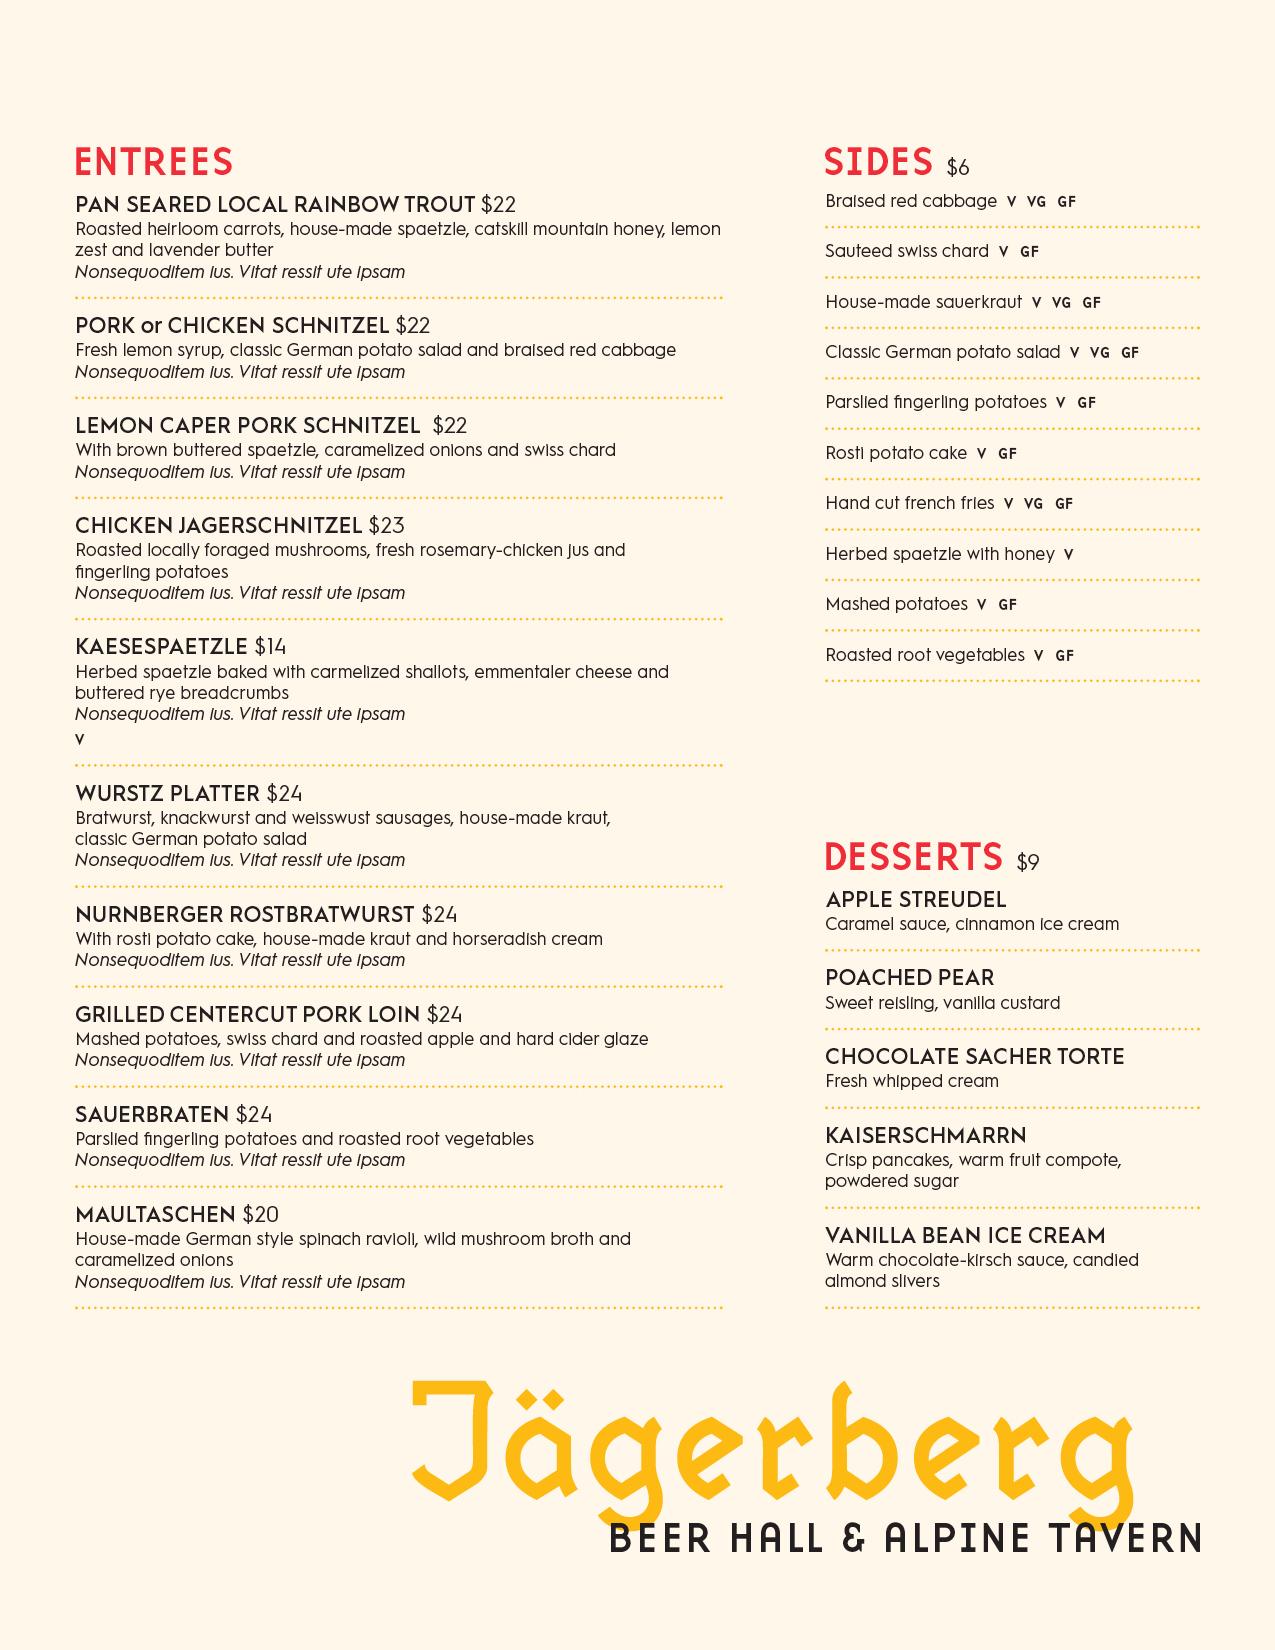 JAG-menu-8p5x11-R3-FINAL2.jpg